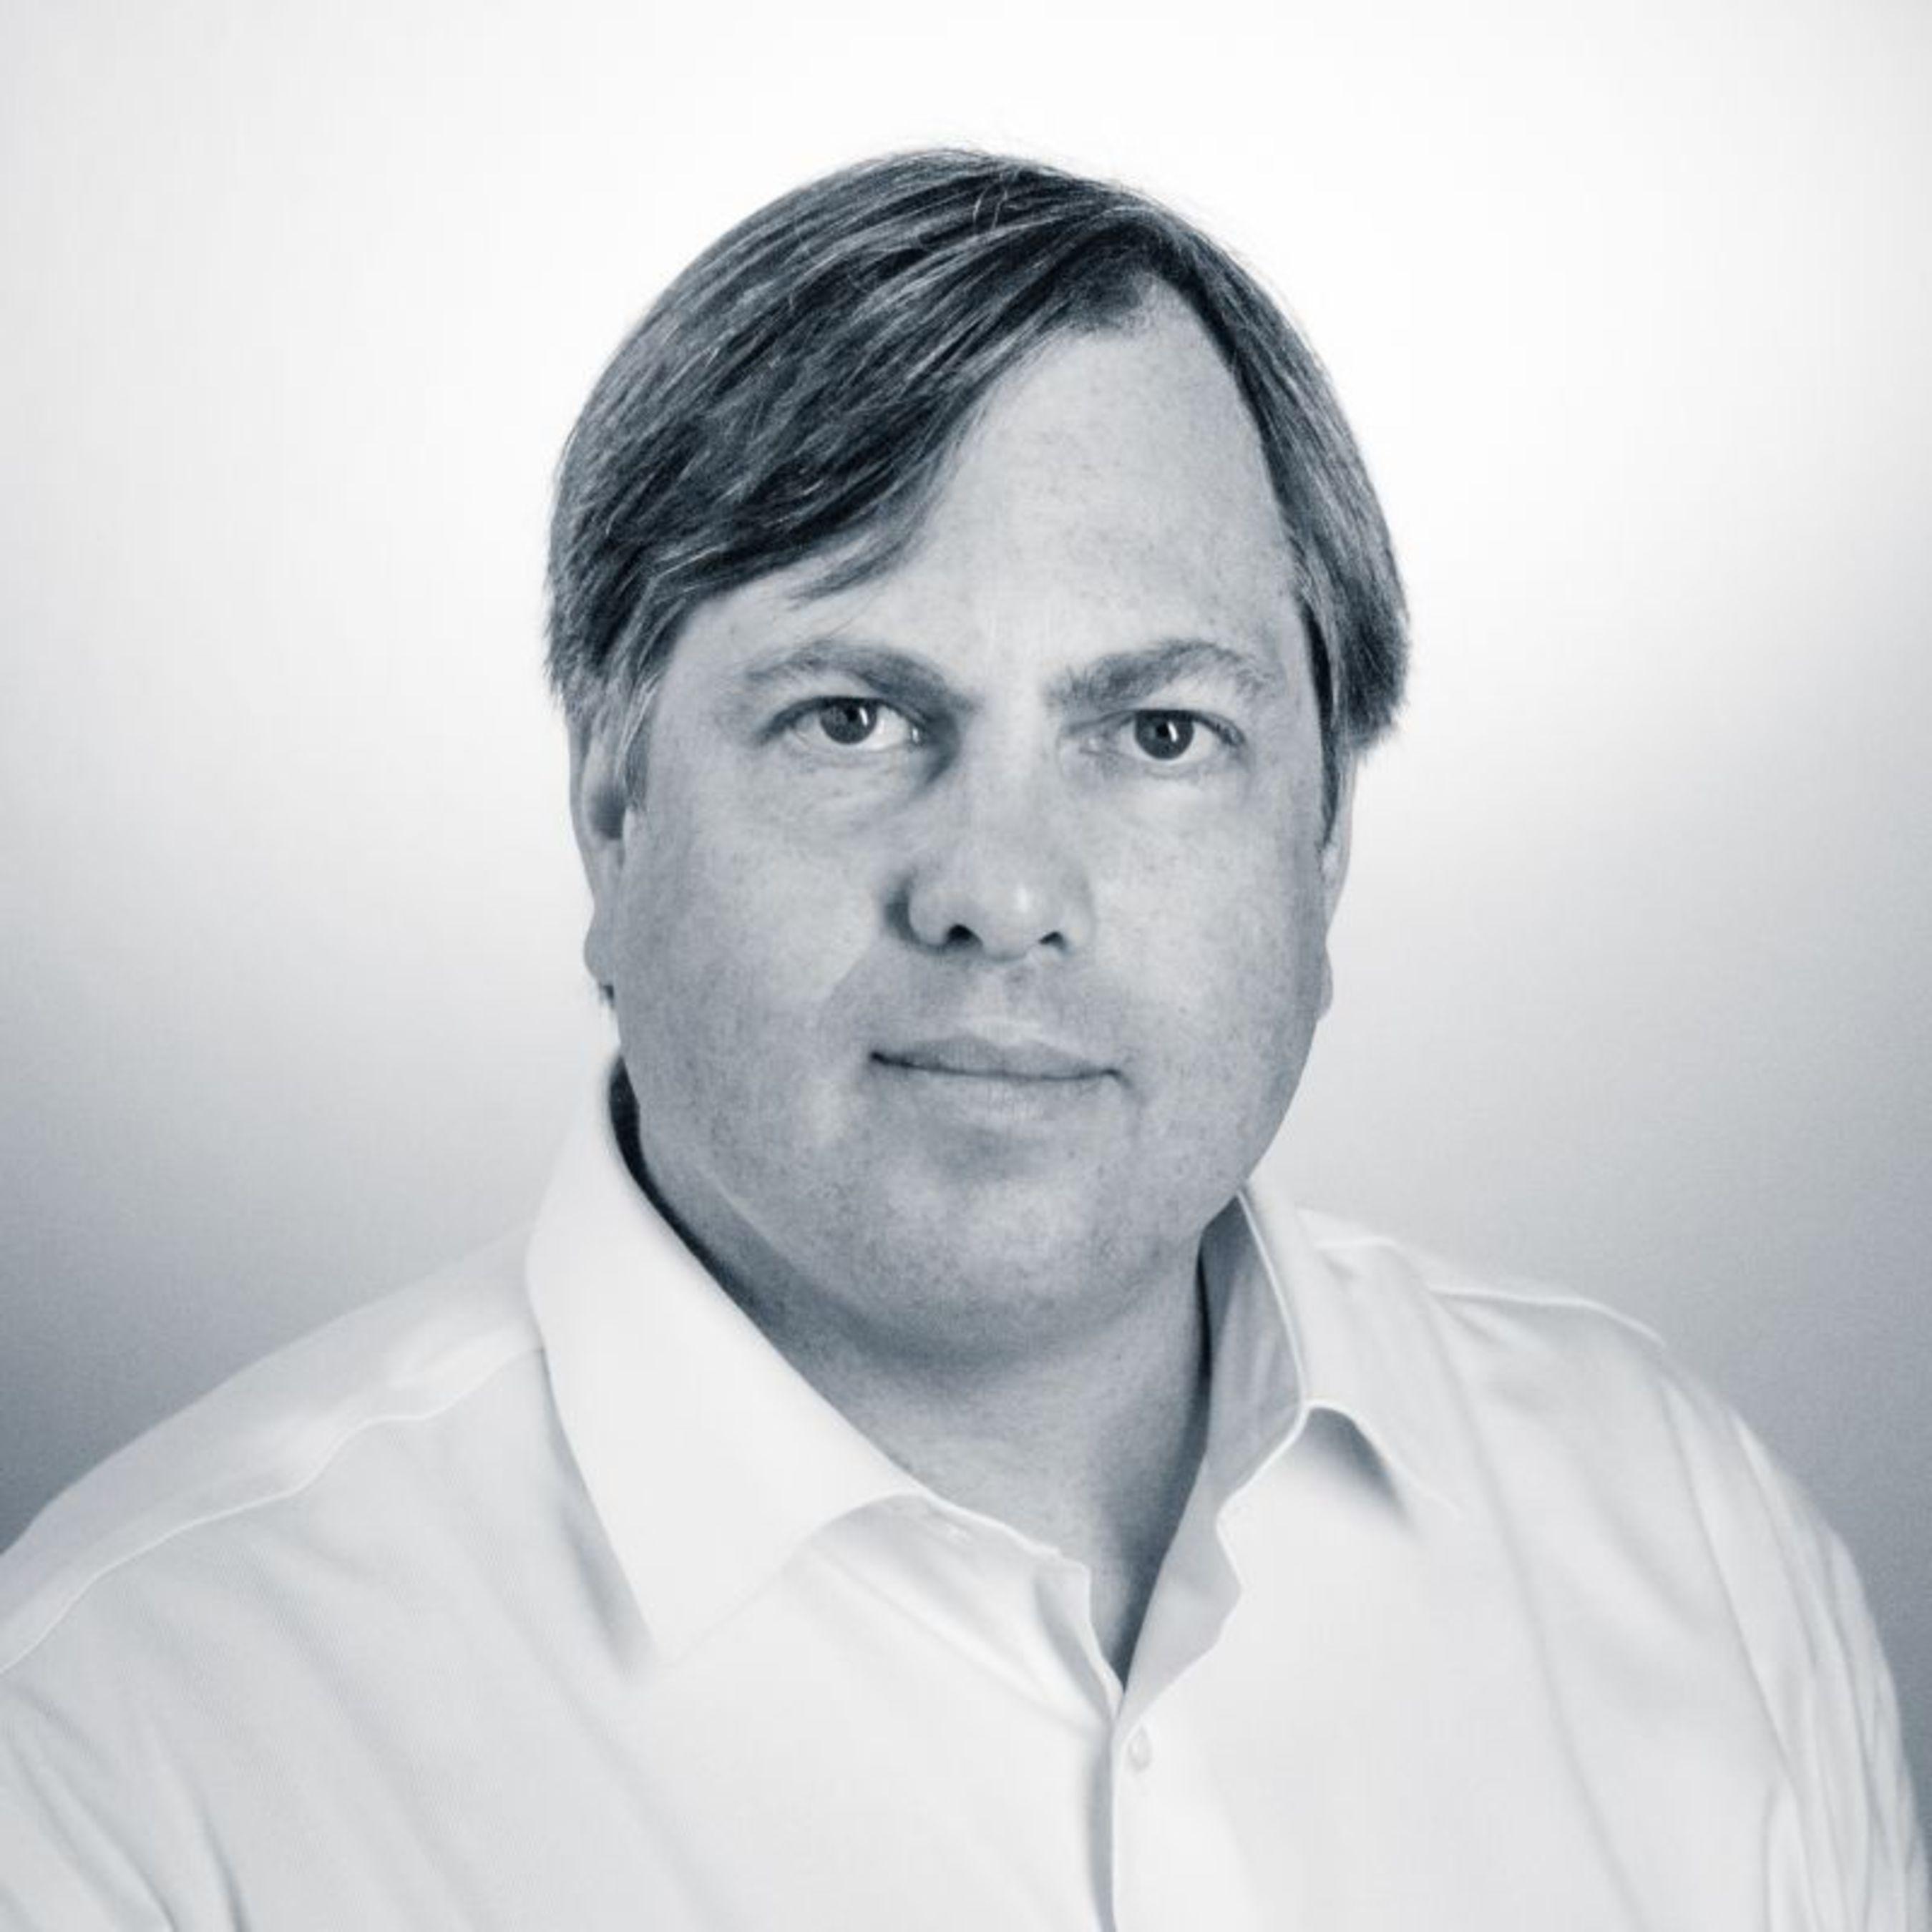 Paul Johnson, Vice President of Global Sales, RhodeCode. (PRNewsFoto/RhodeCode, Inc.)